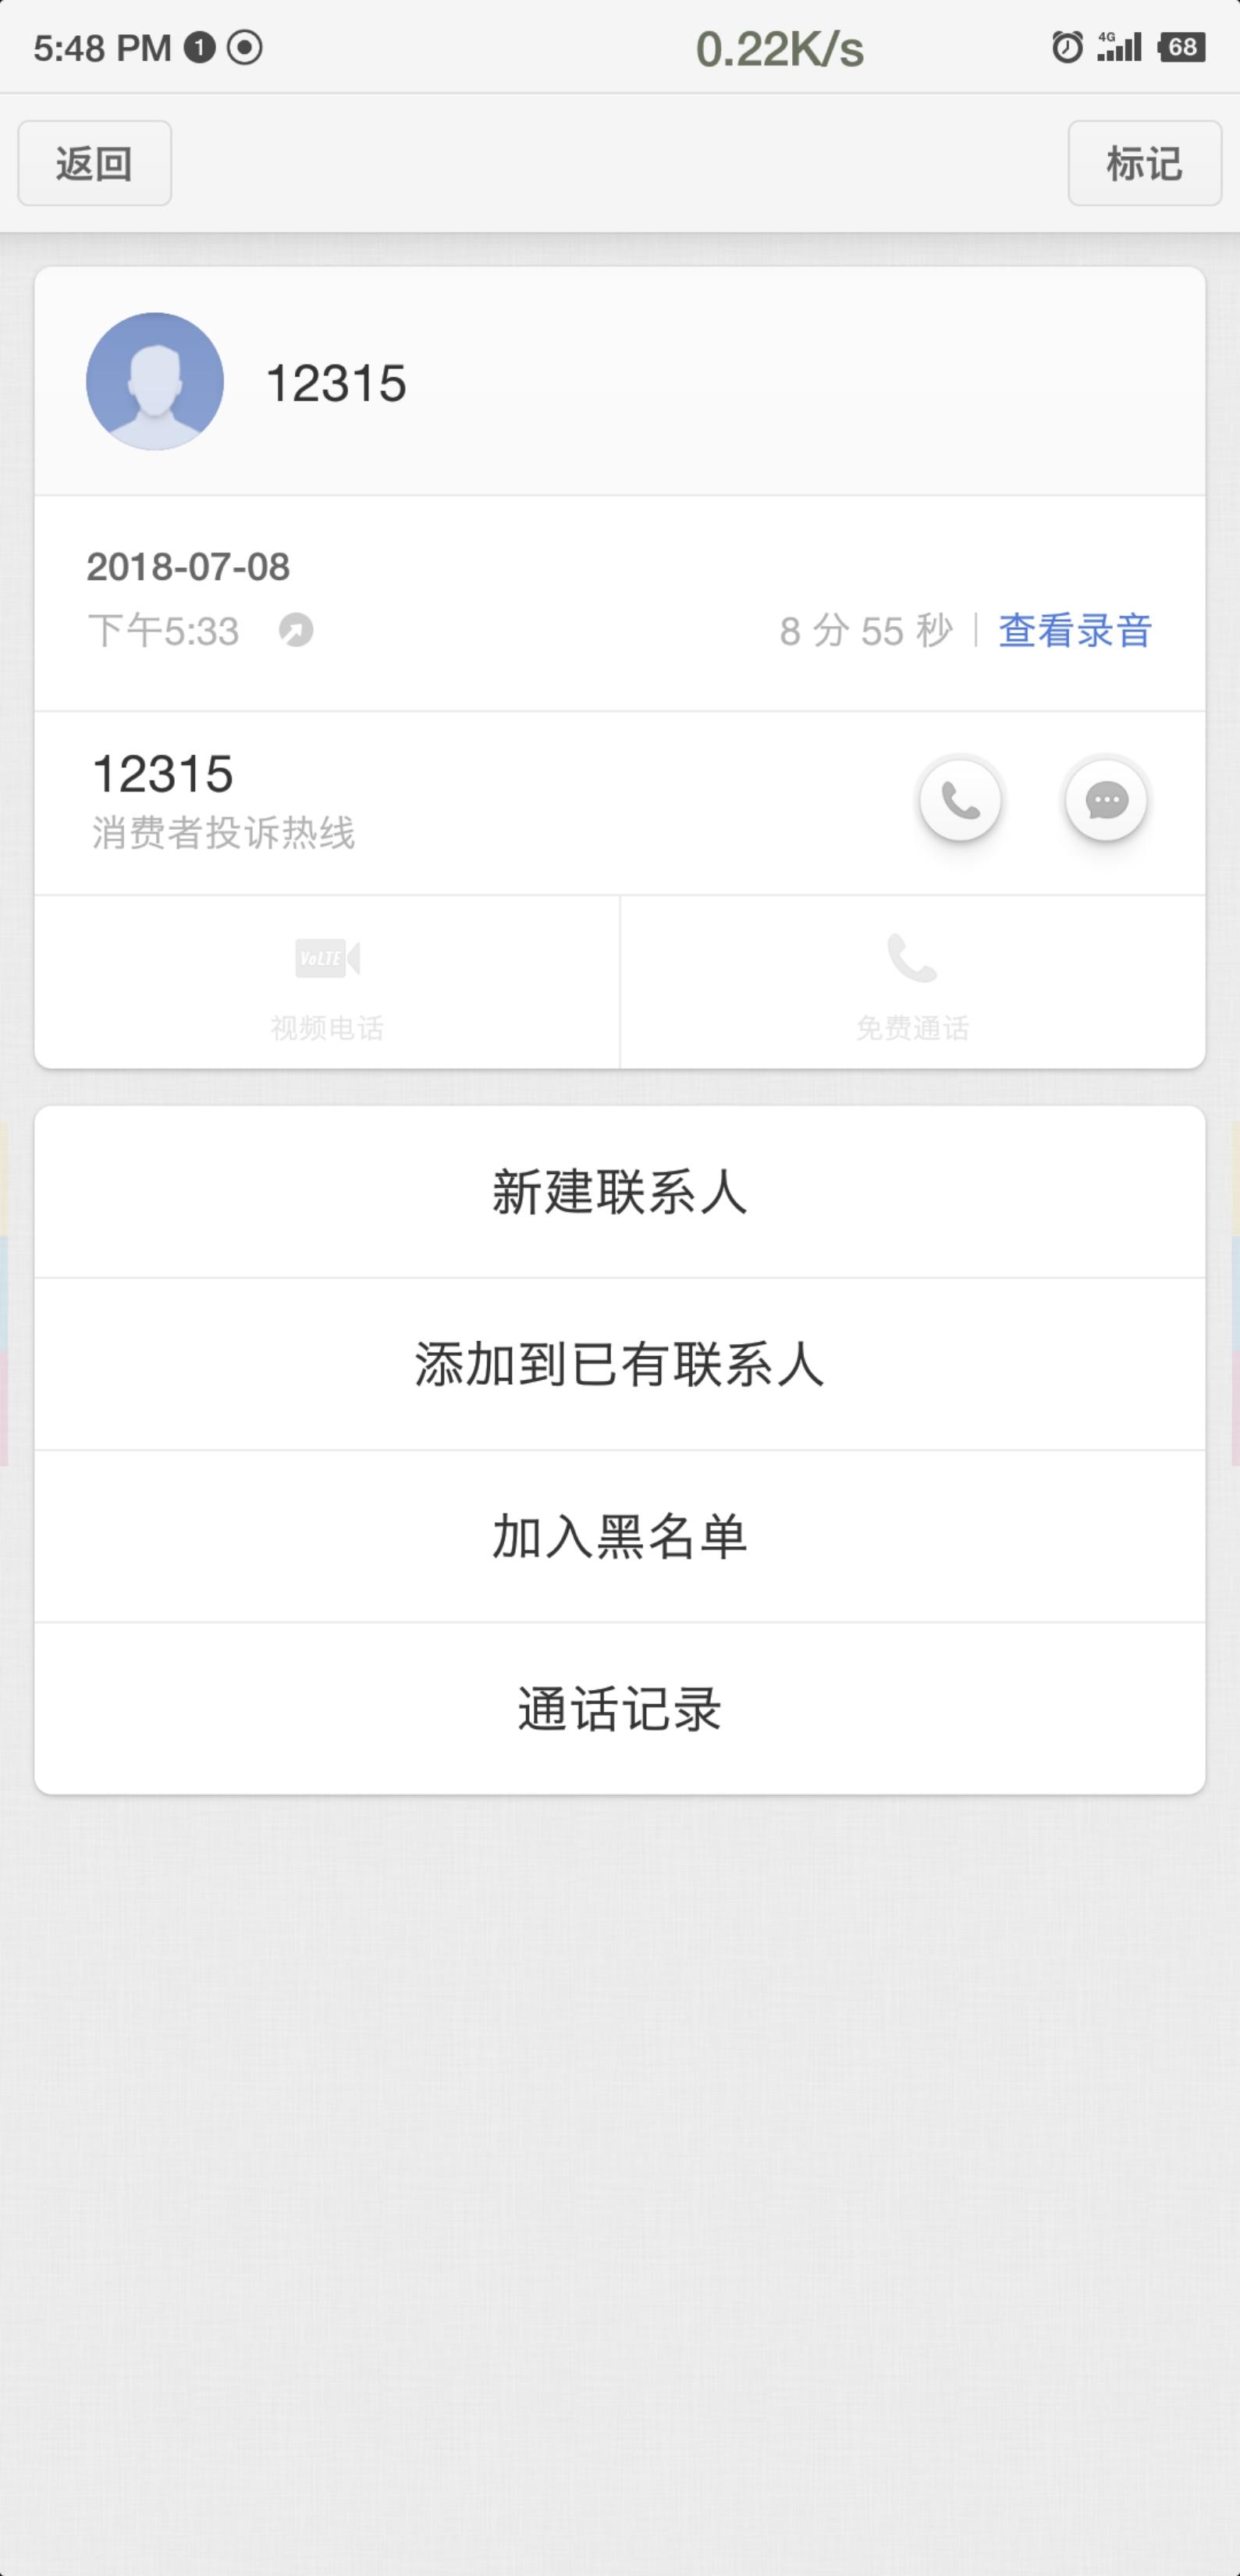 Screenshot_2018-07-08-17-49-00-202_??.png